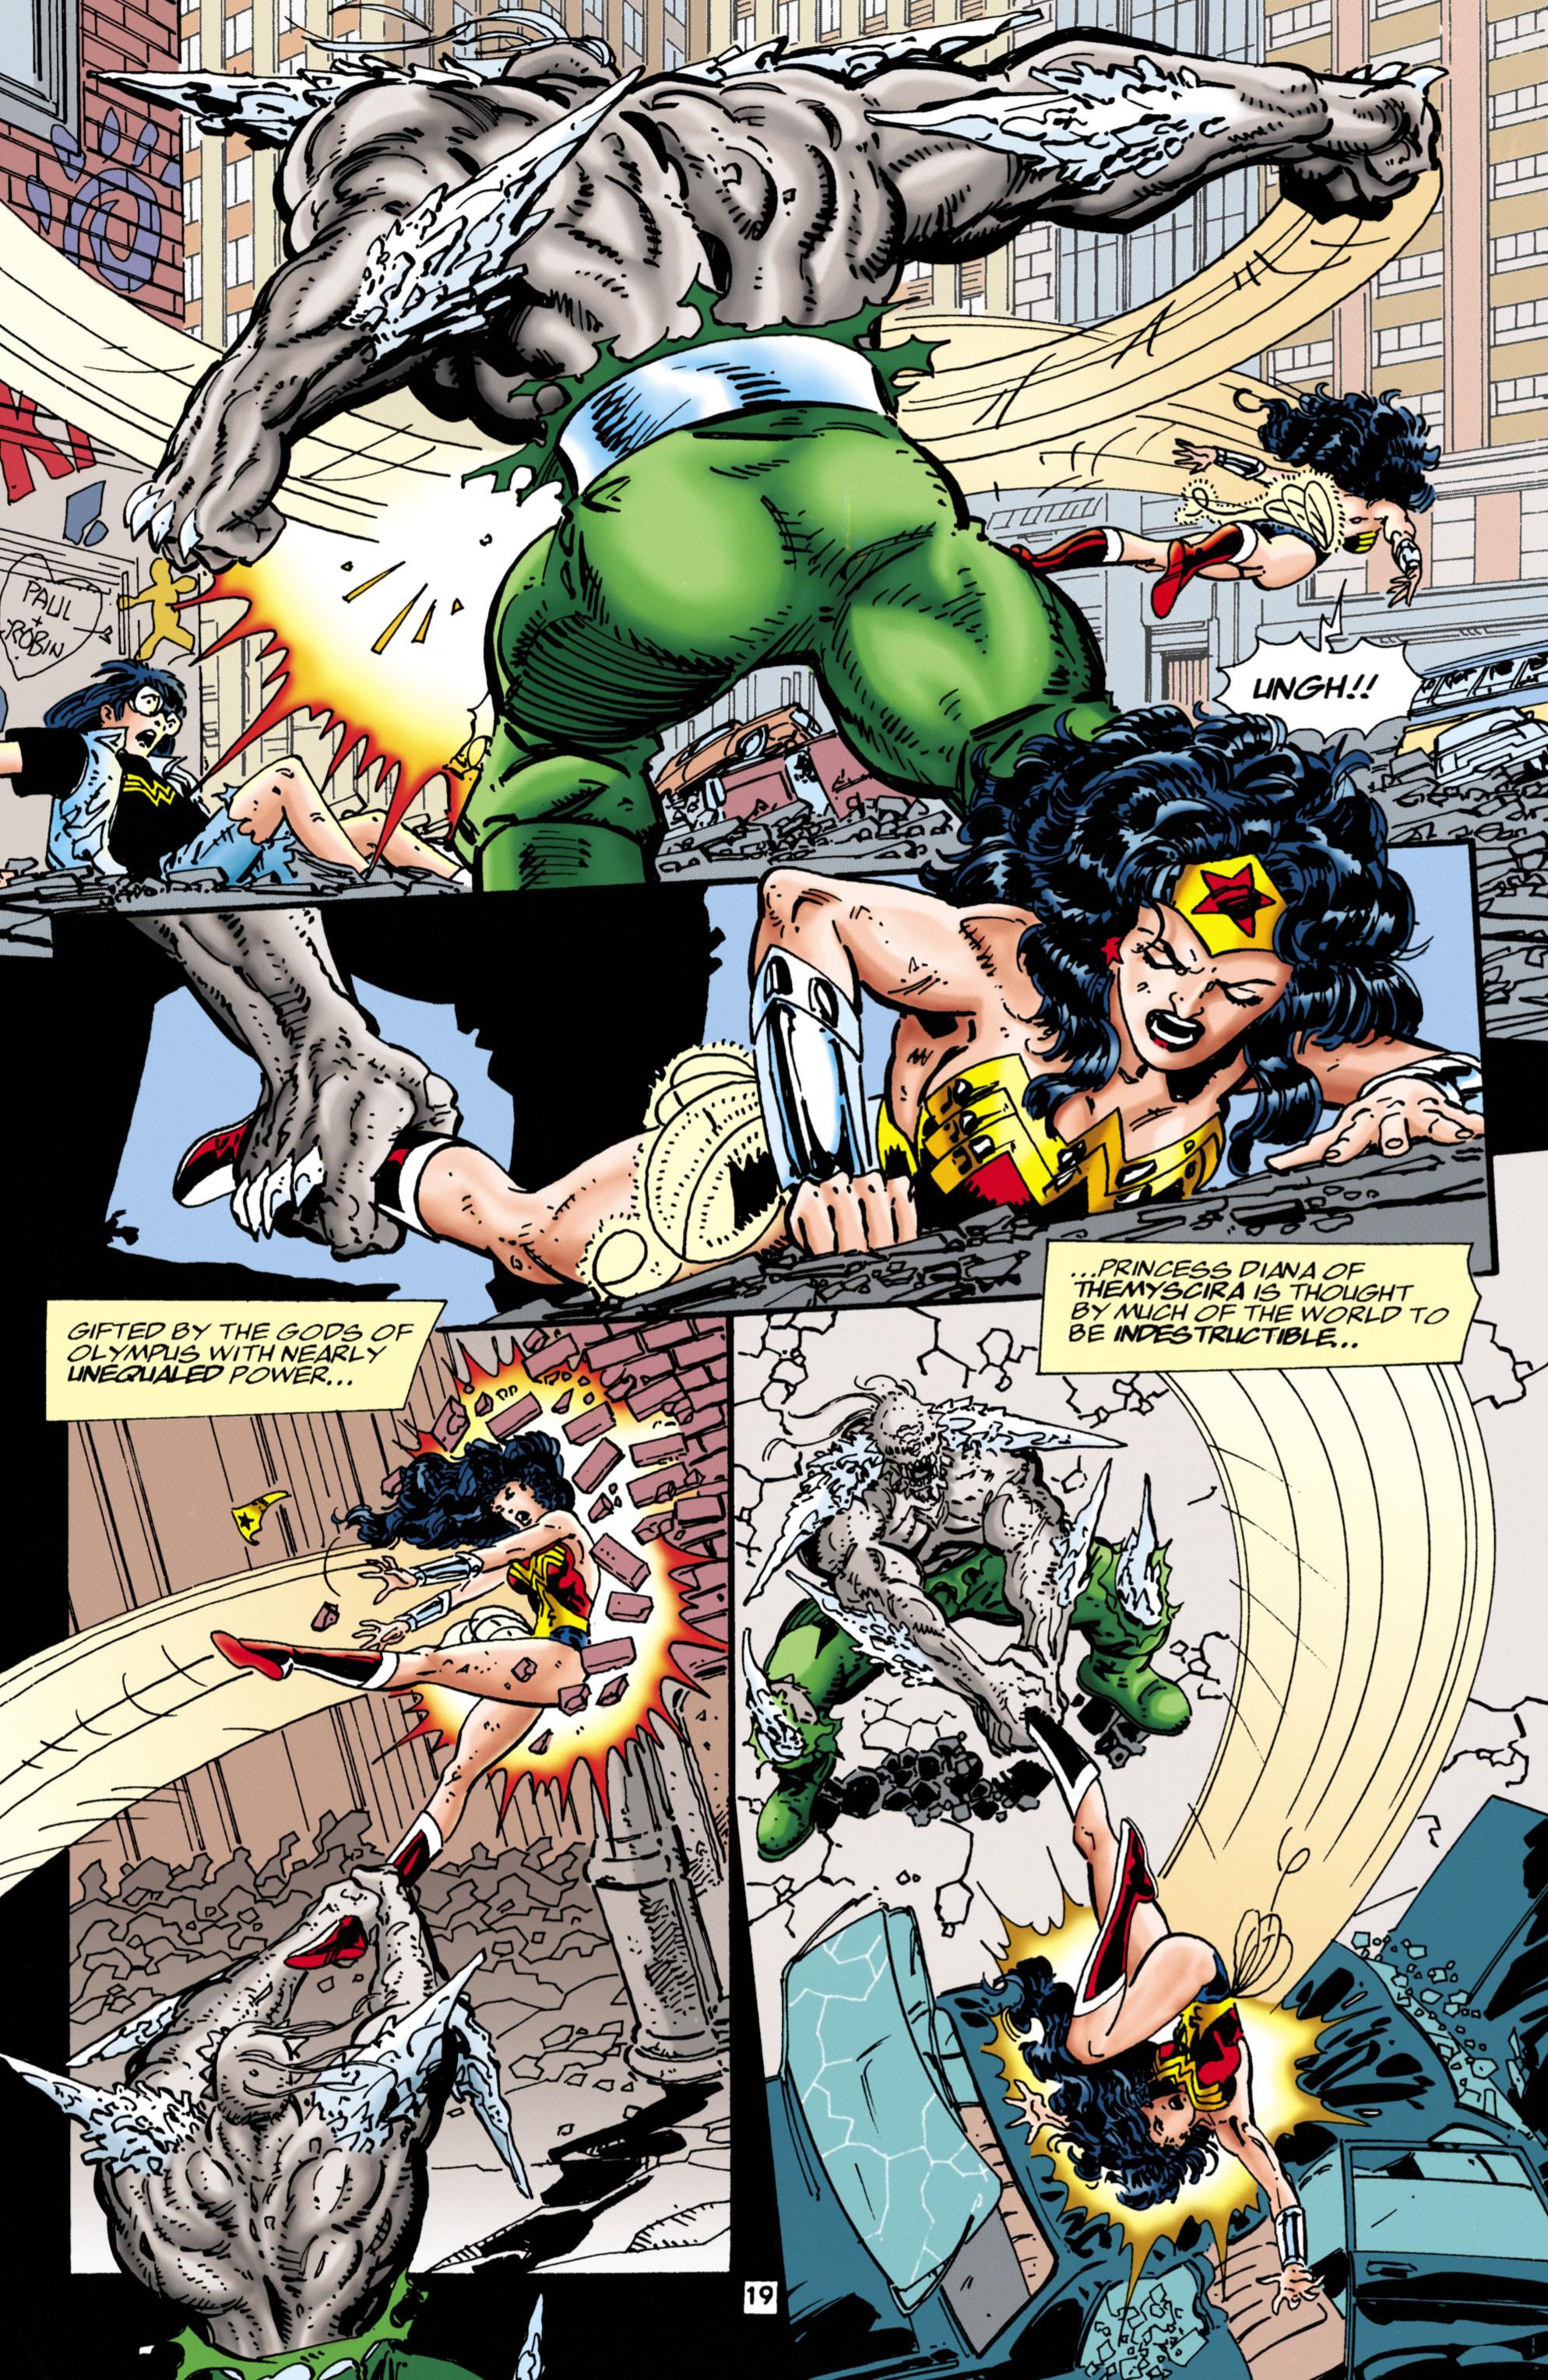 Read online Wonder Woman (1987) comic -  Issue #111 - 19